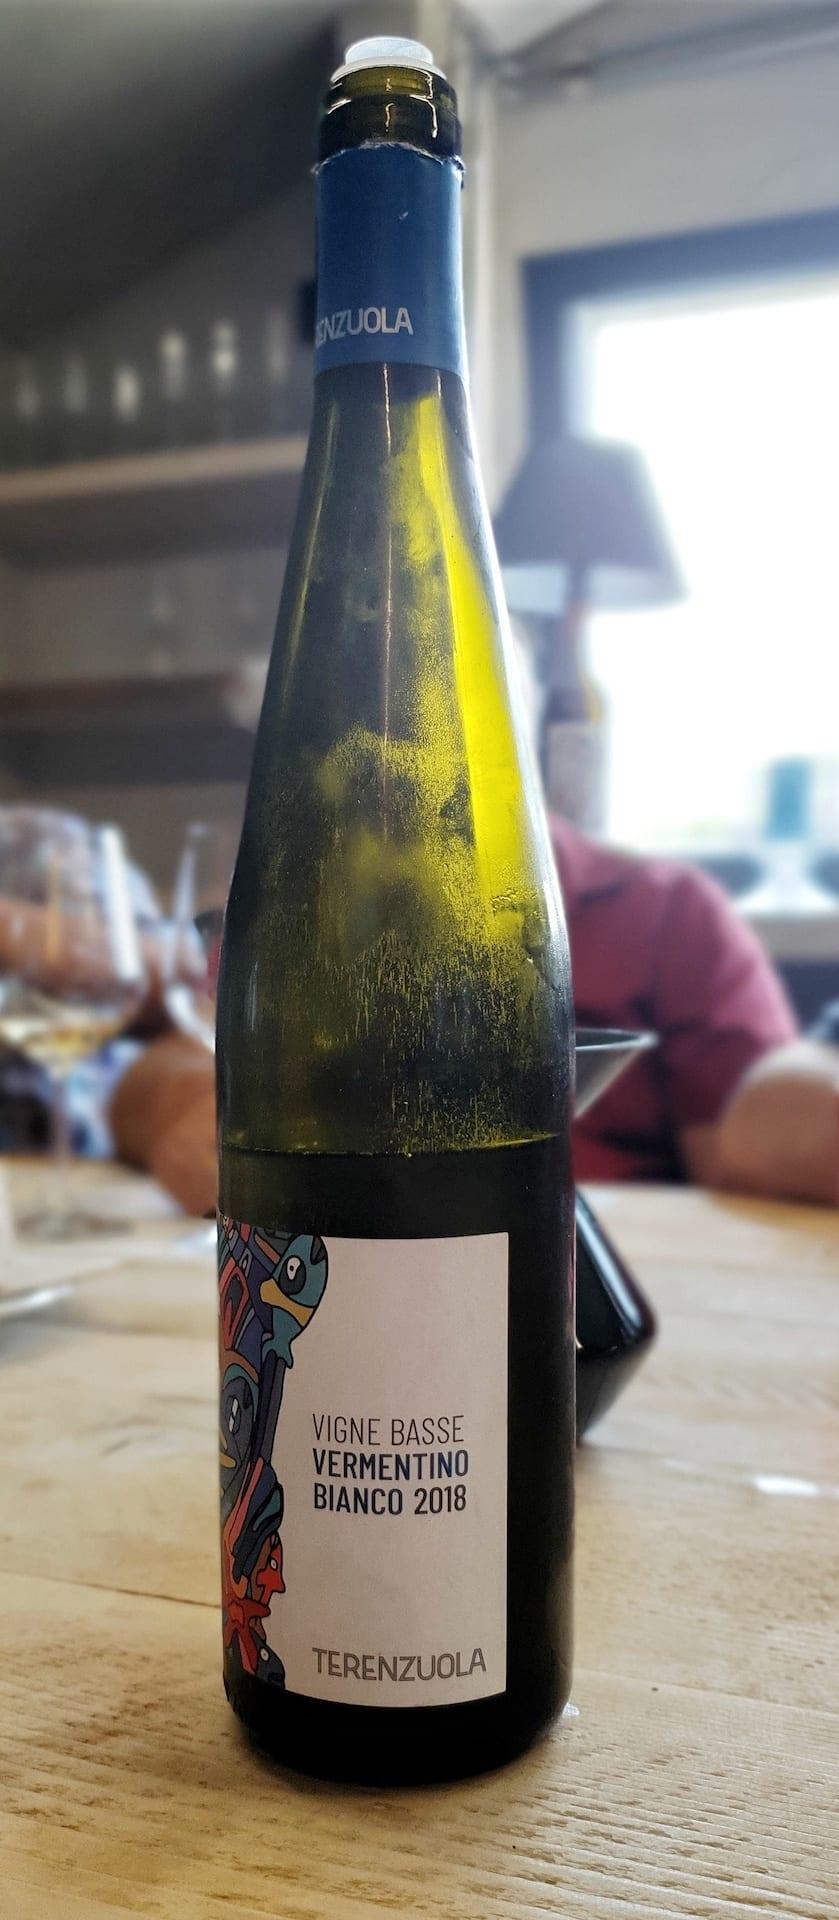 Vigne Basse 2018 di Terenzuola